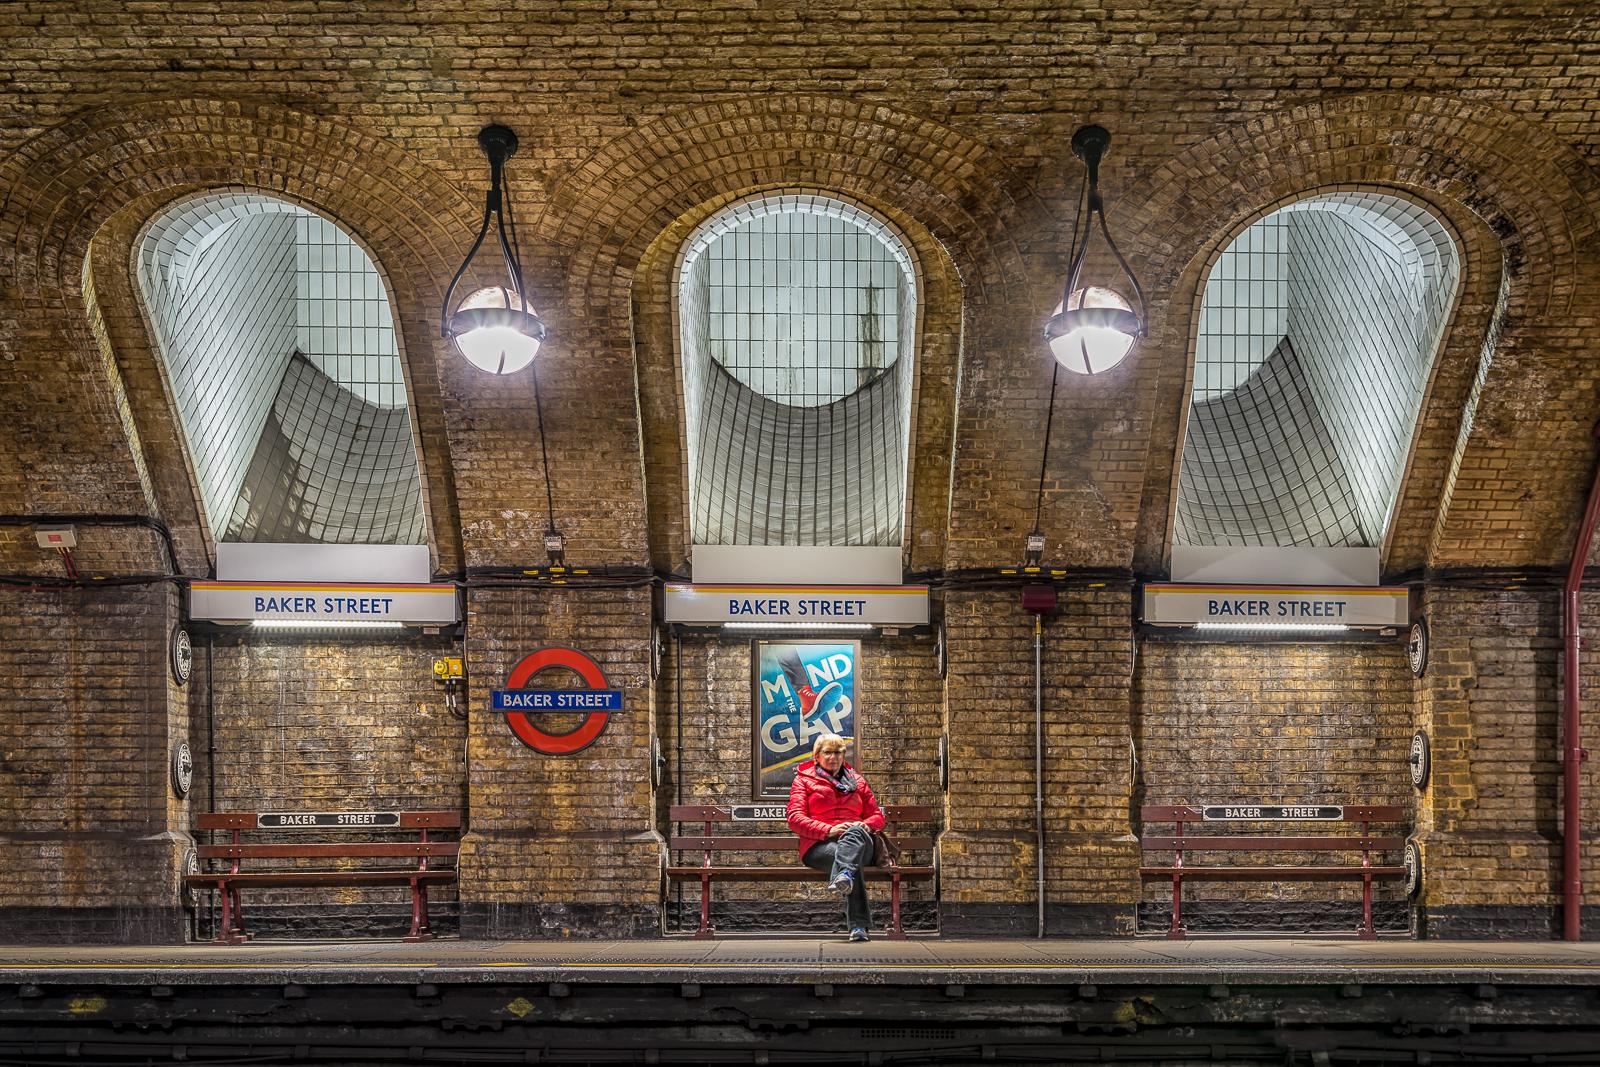 Baker Street - Mind the Gap